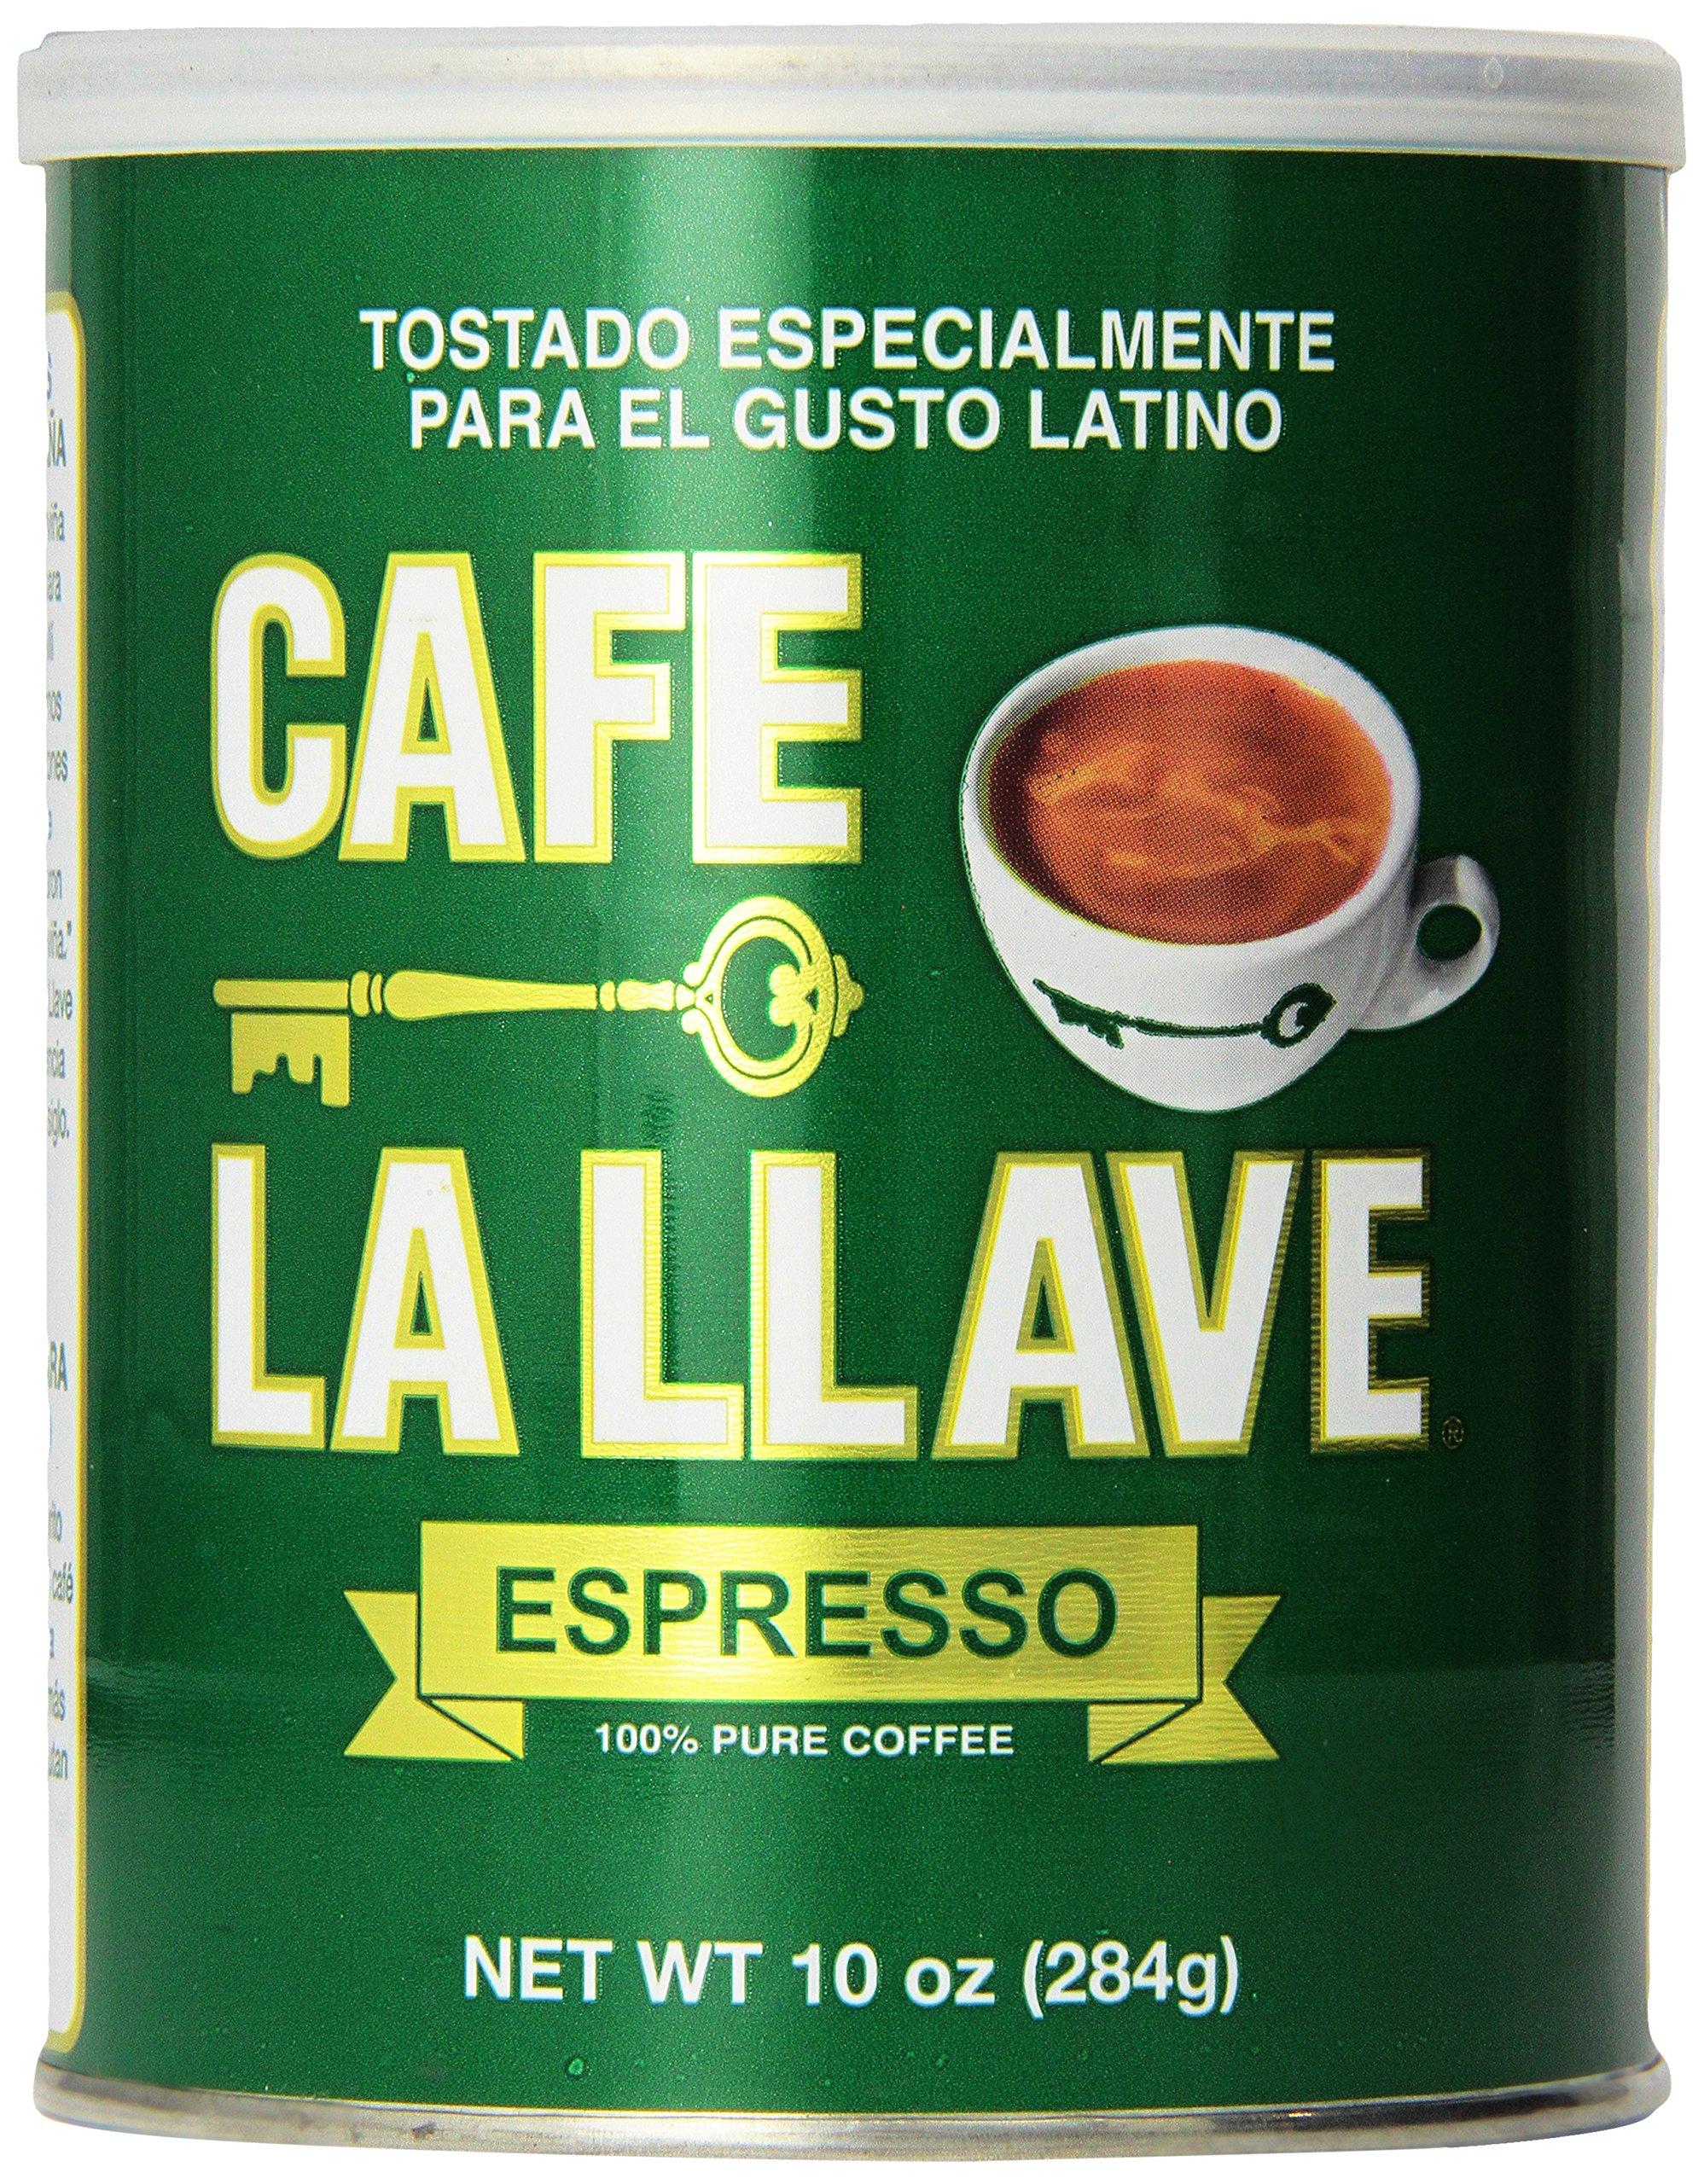 Café La Llave Espresso, 100% Pure Coffee, Latin Espresso, Dark Roast, Finely Ground, 10-Ounce Can